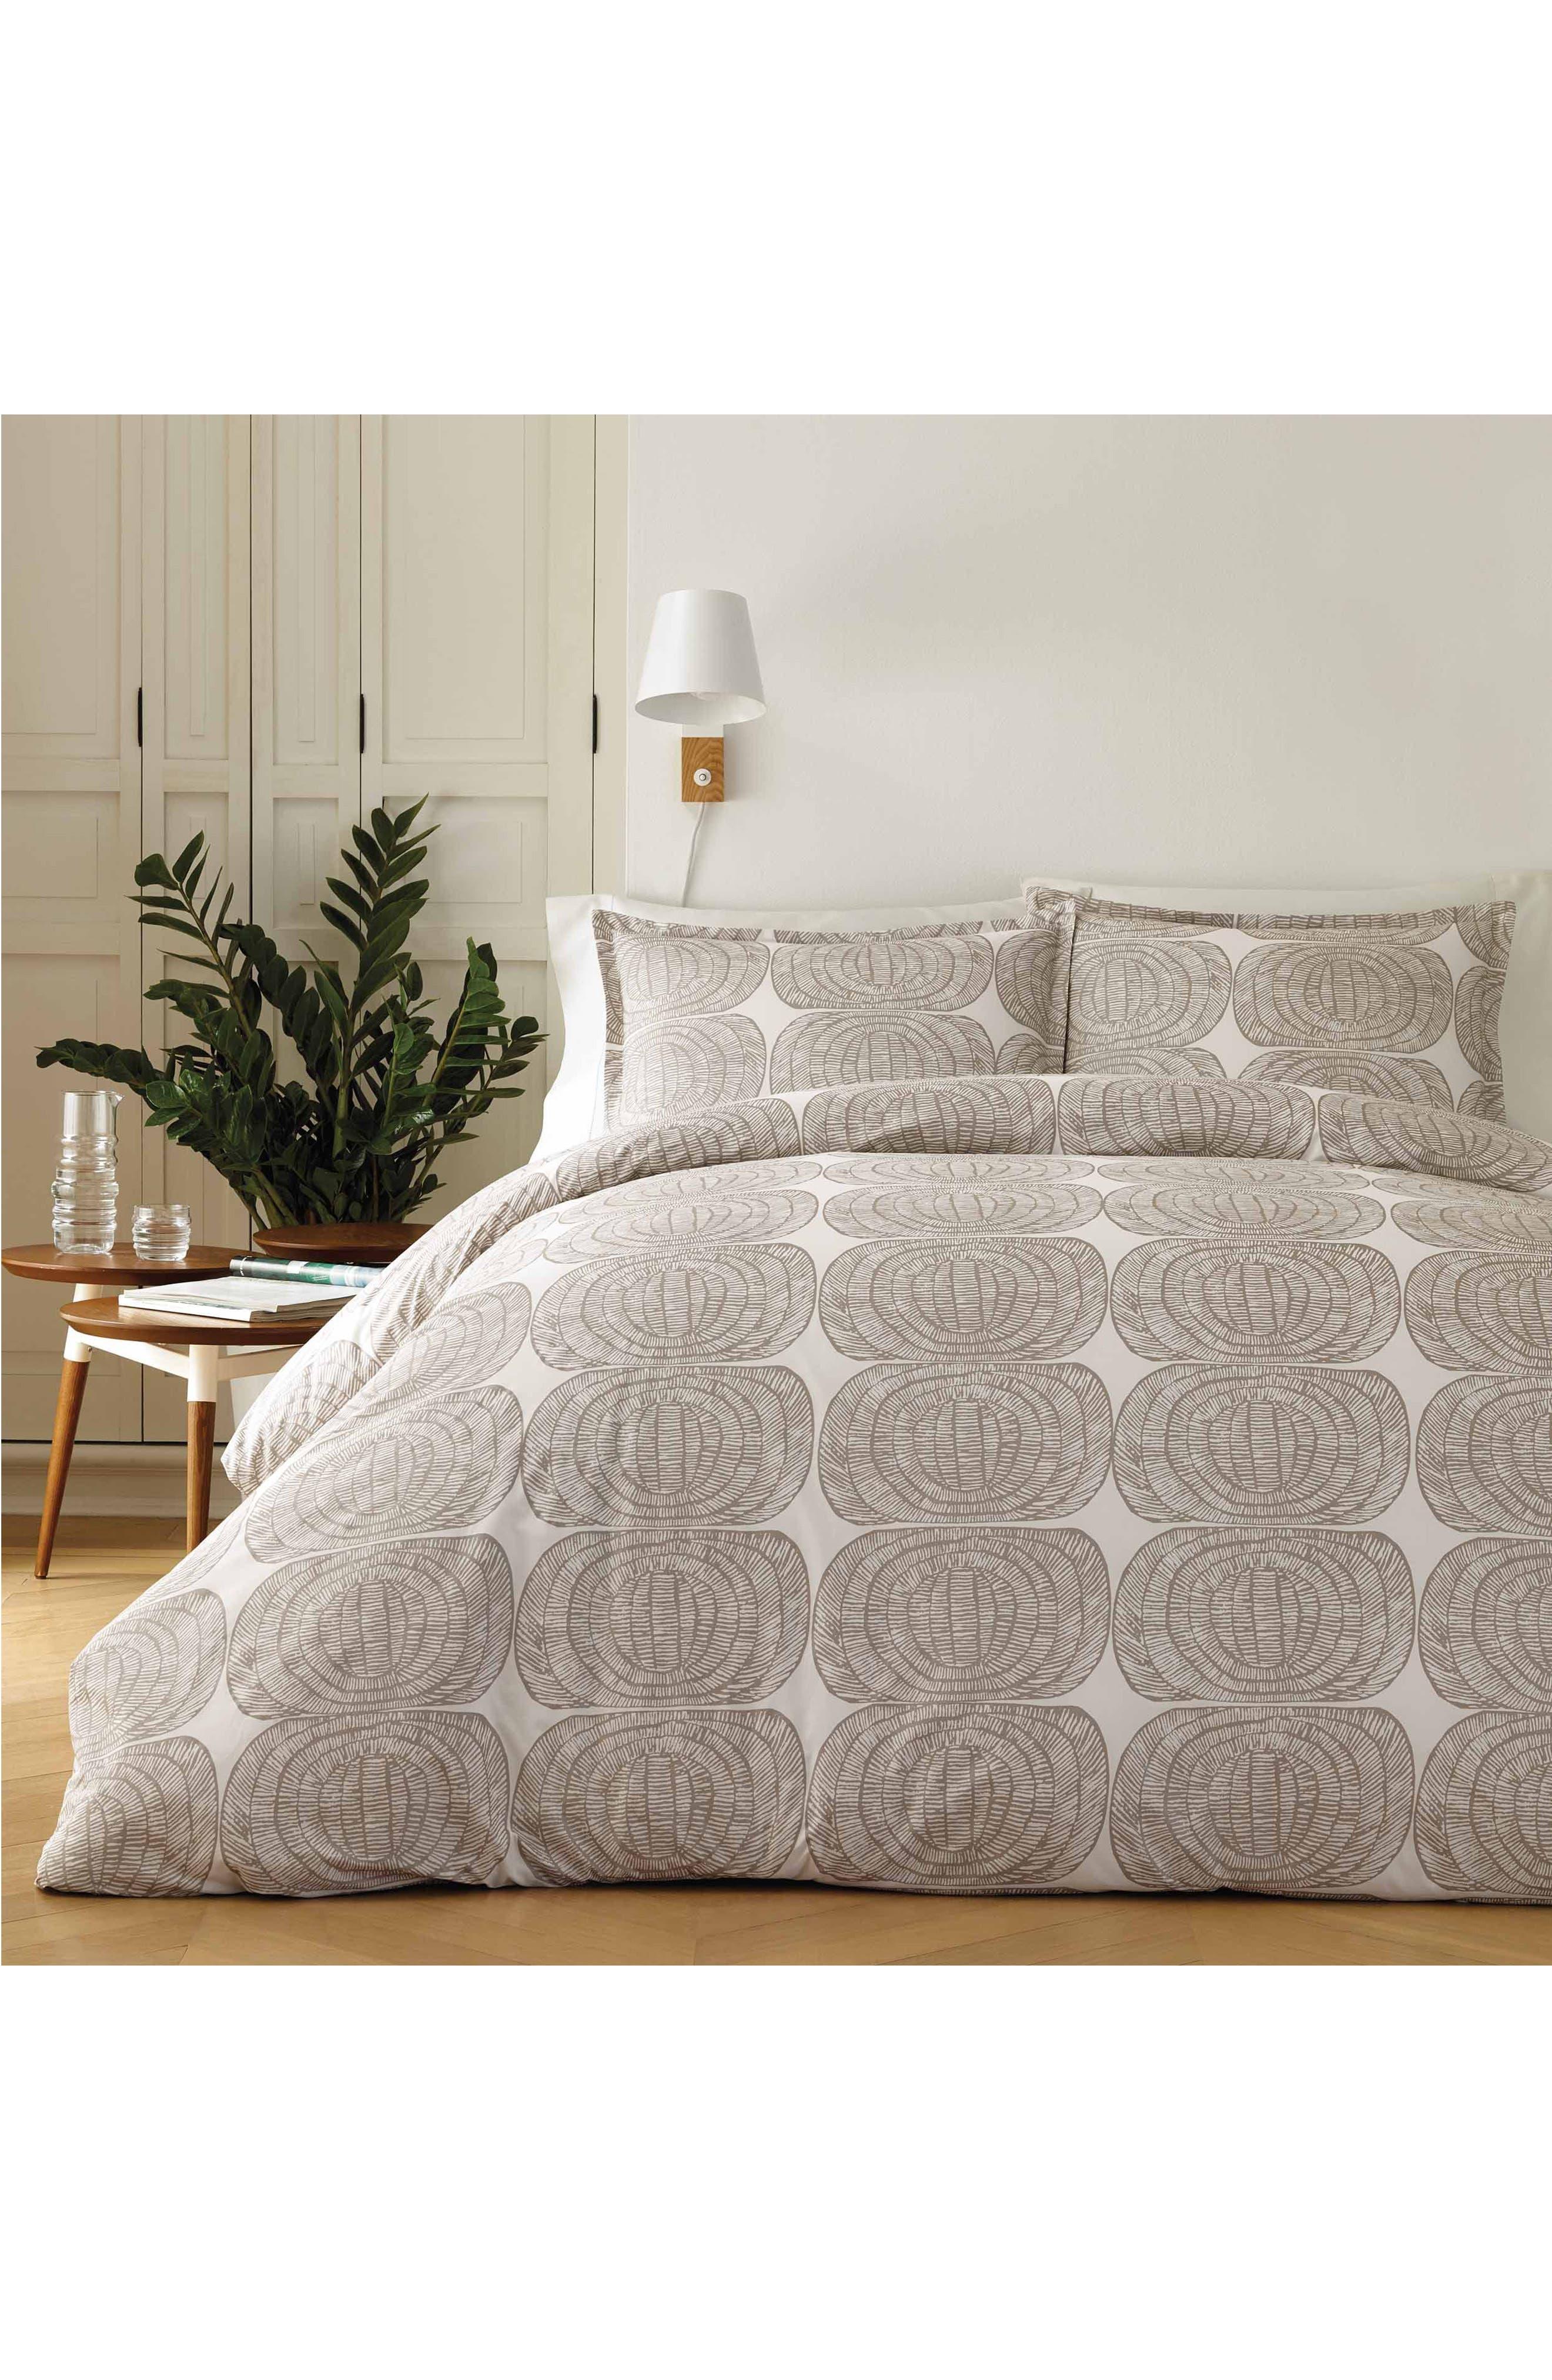 Marimekko Mehiläispesä Comforter & Sham Set